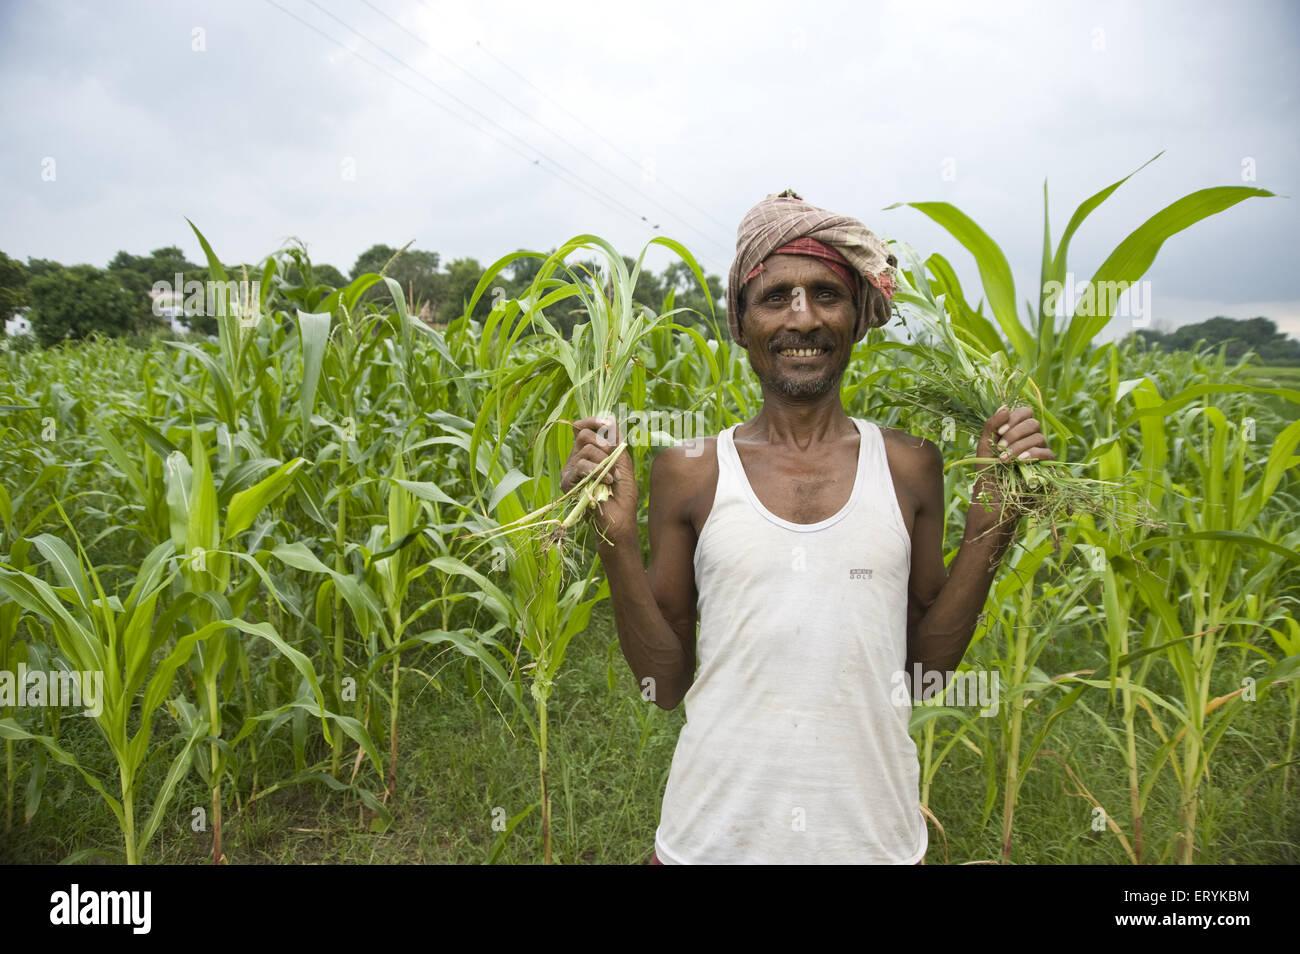 farmer in rice field jaunpur at uttar pradesh India  MR#707 H - Stock Image